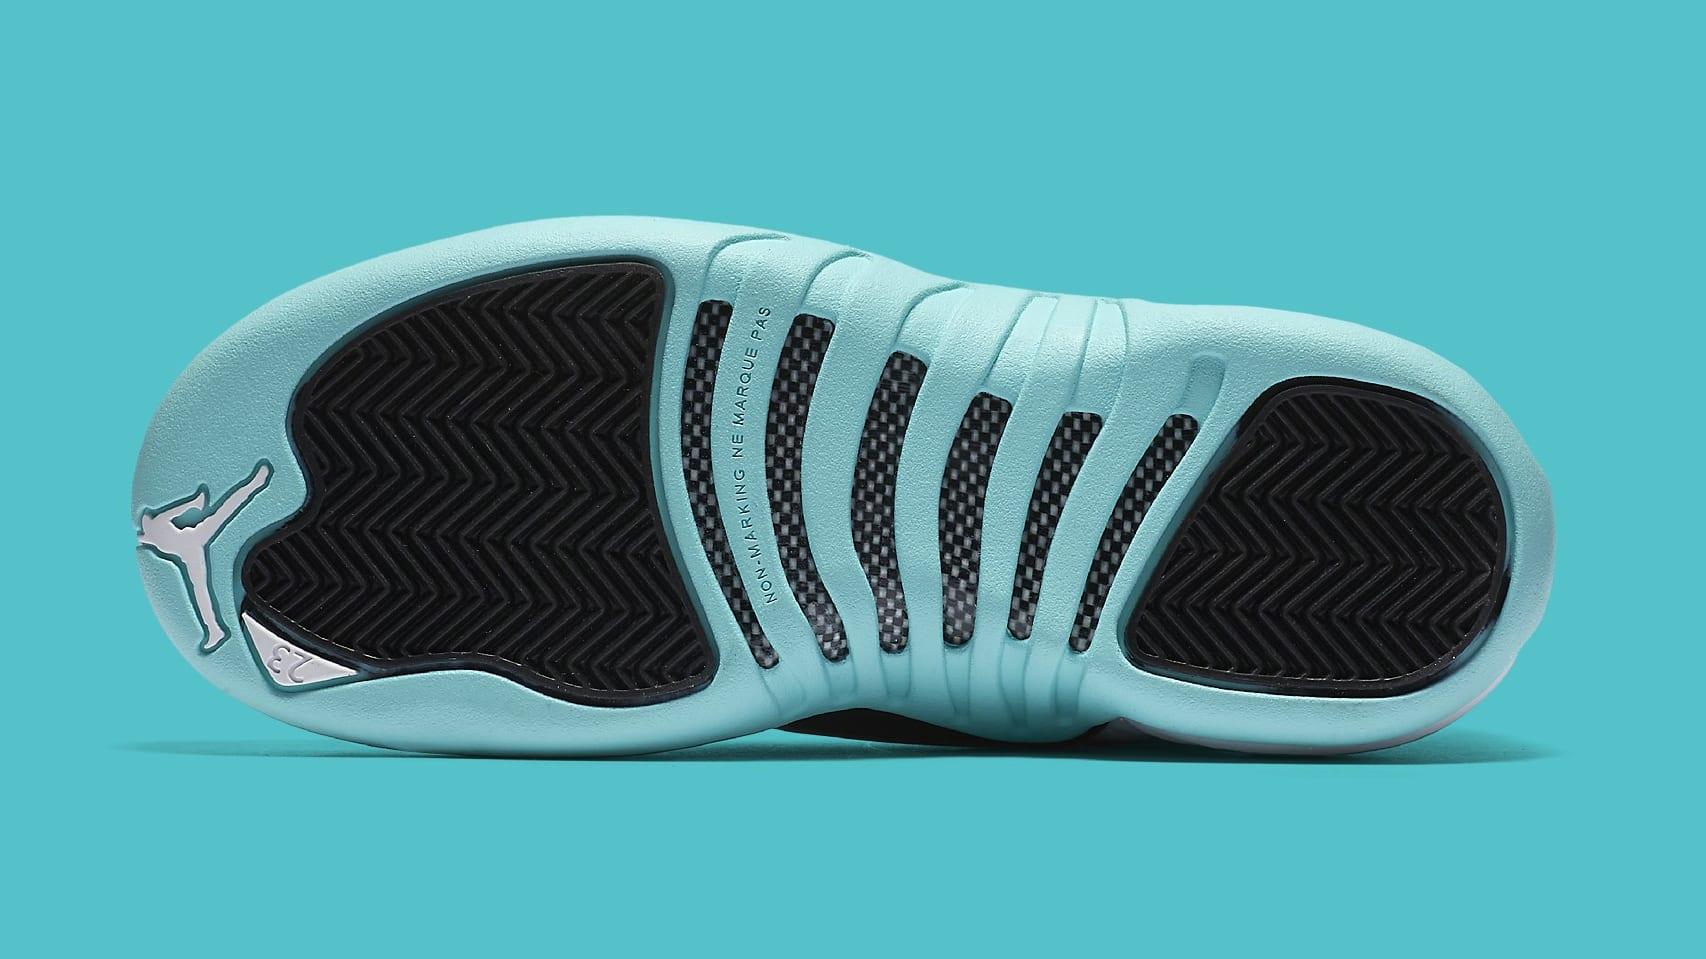 b061f984c49 The 'Light Aqua' Air Jordan 12 Retro Is on the Way – Sneaker Drama